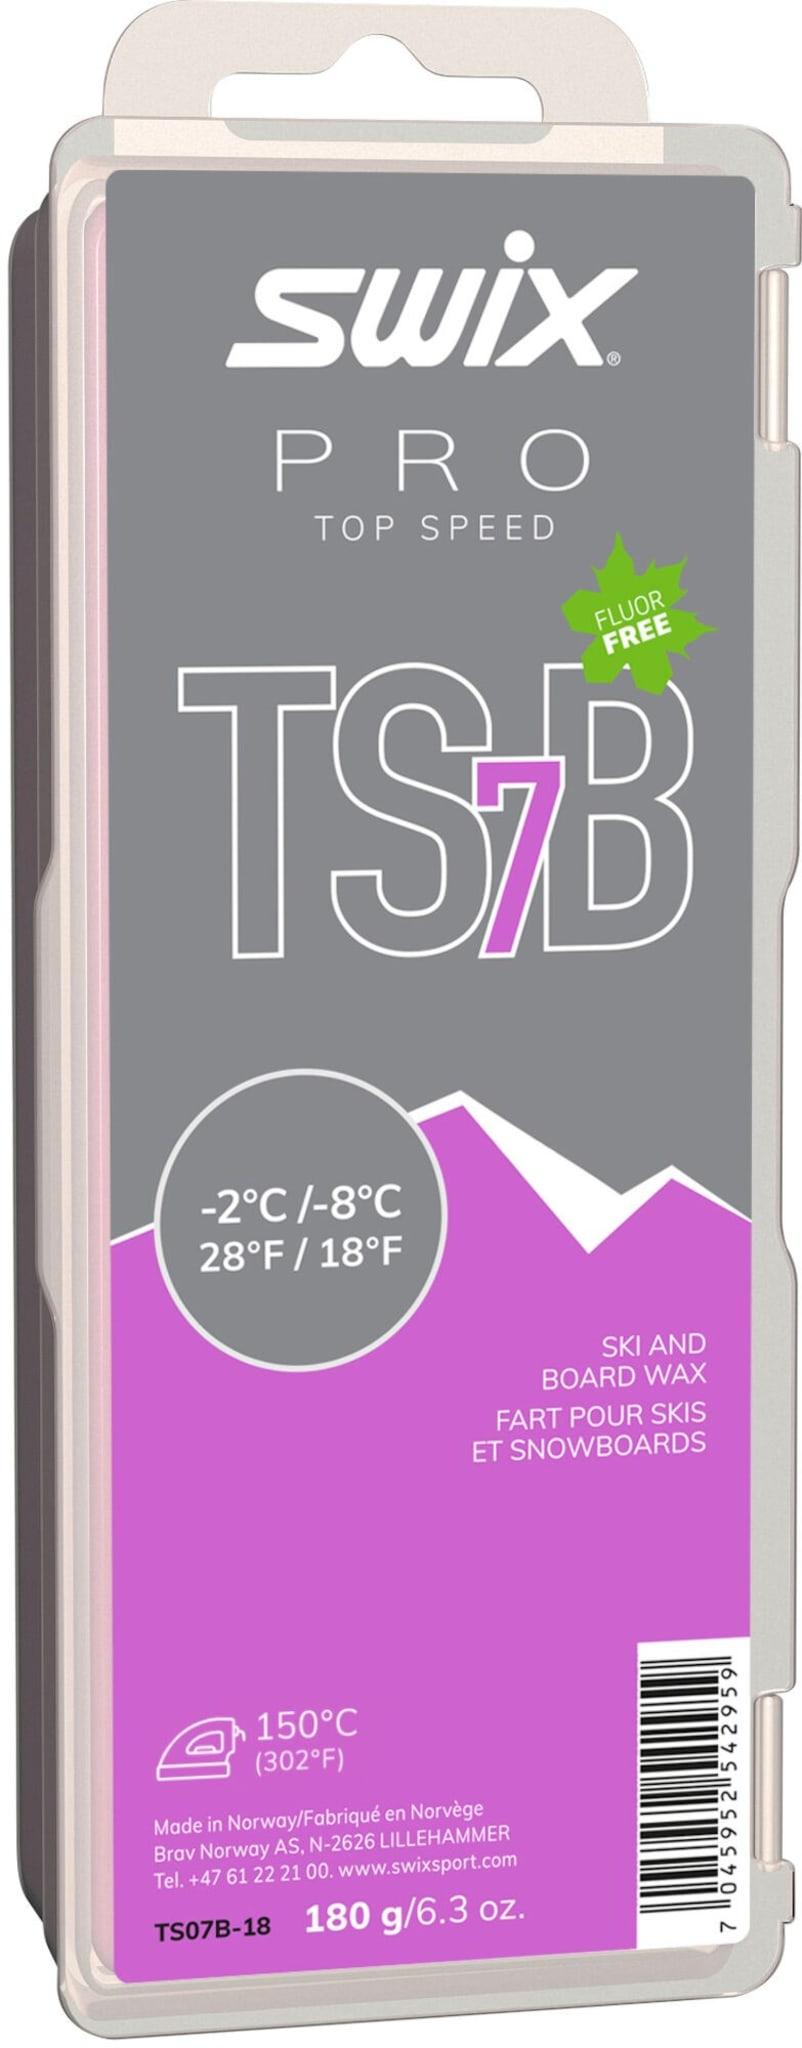 TS7 Black. -2°C/-8°C. 180g